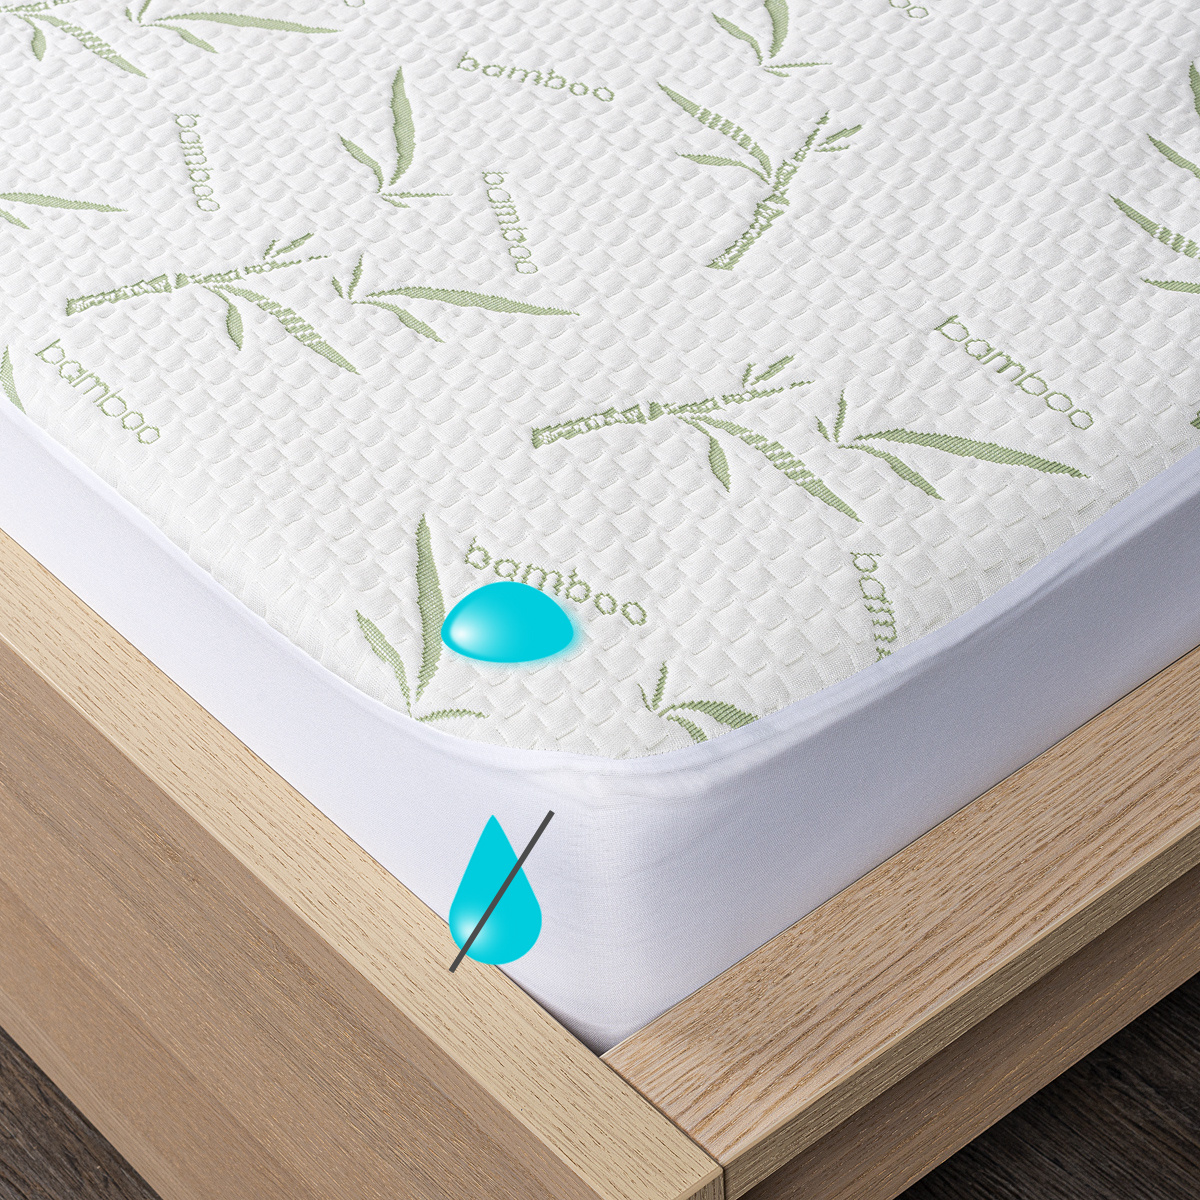 4Home Bamboo Nepropustný chránič matrace s lemem, 180 x 200 cm